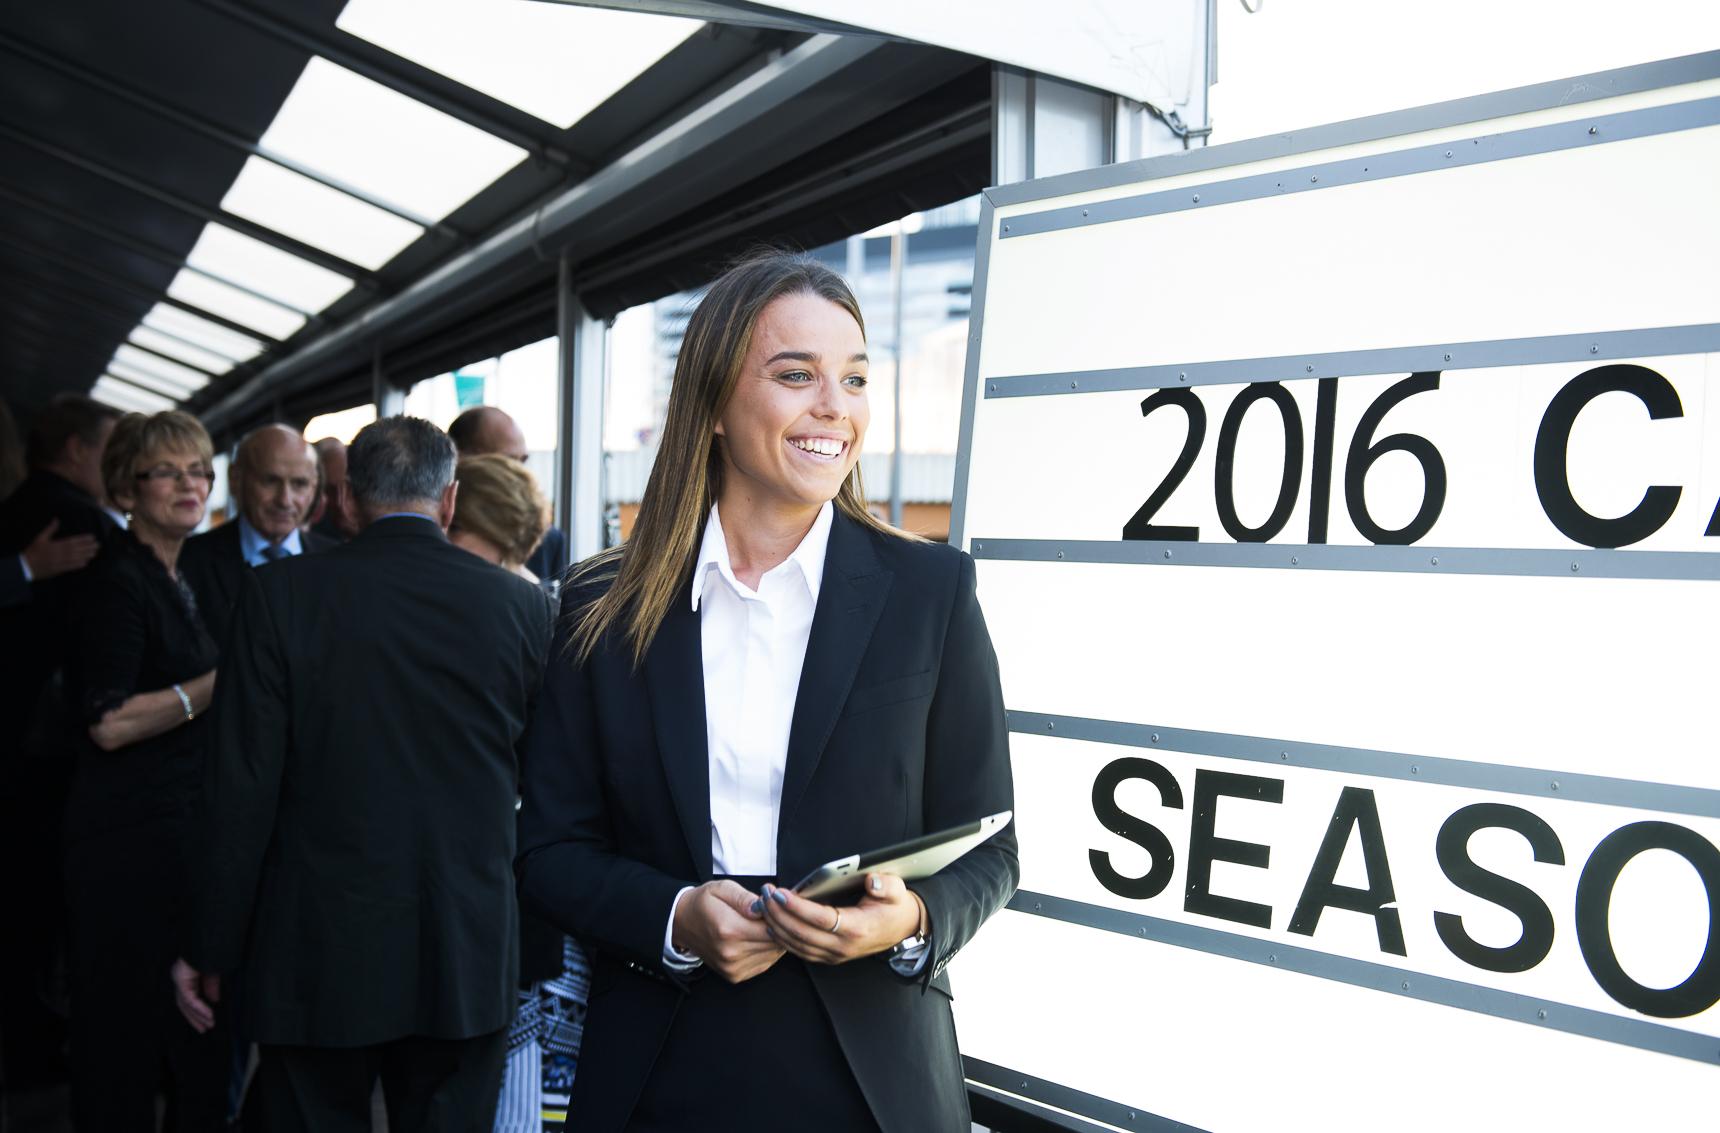 2016 Season Launch